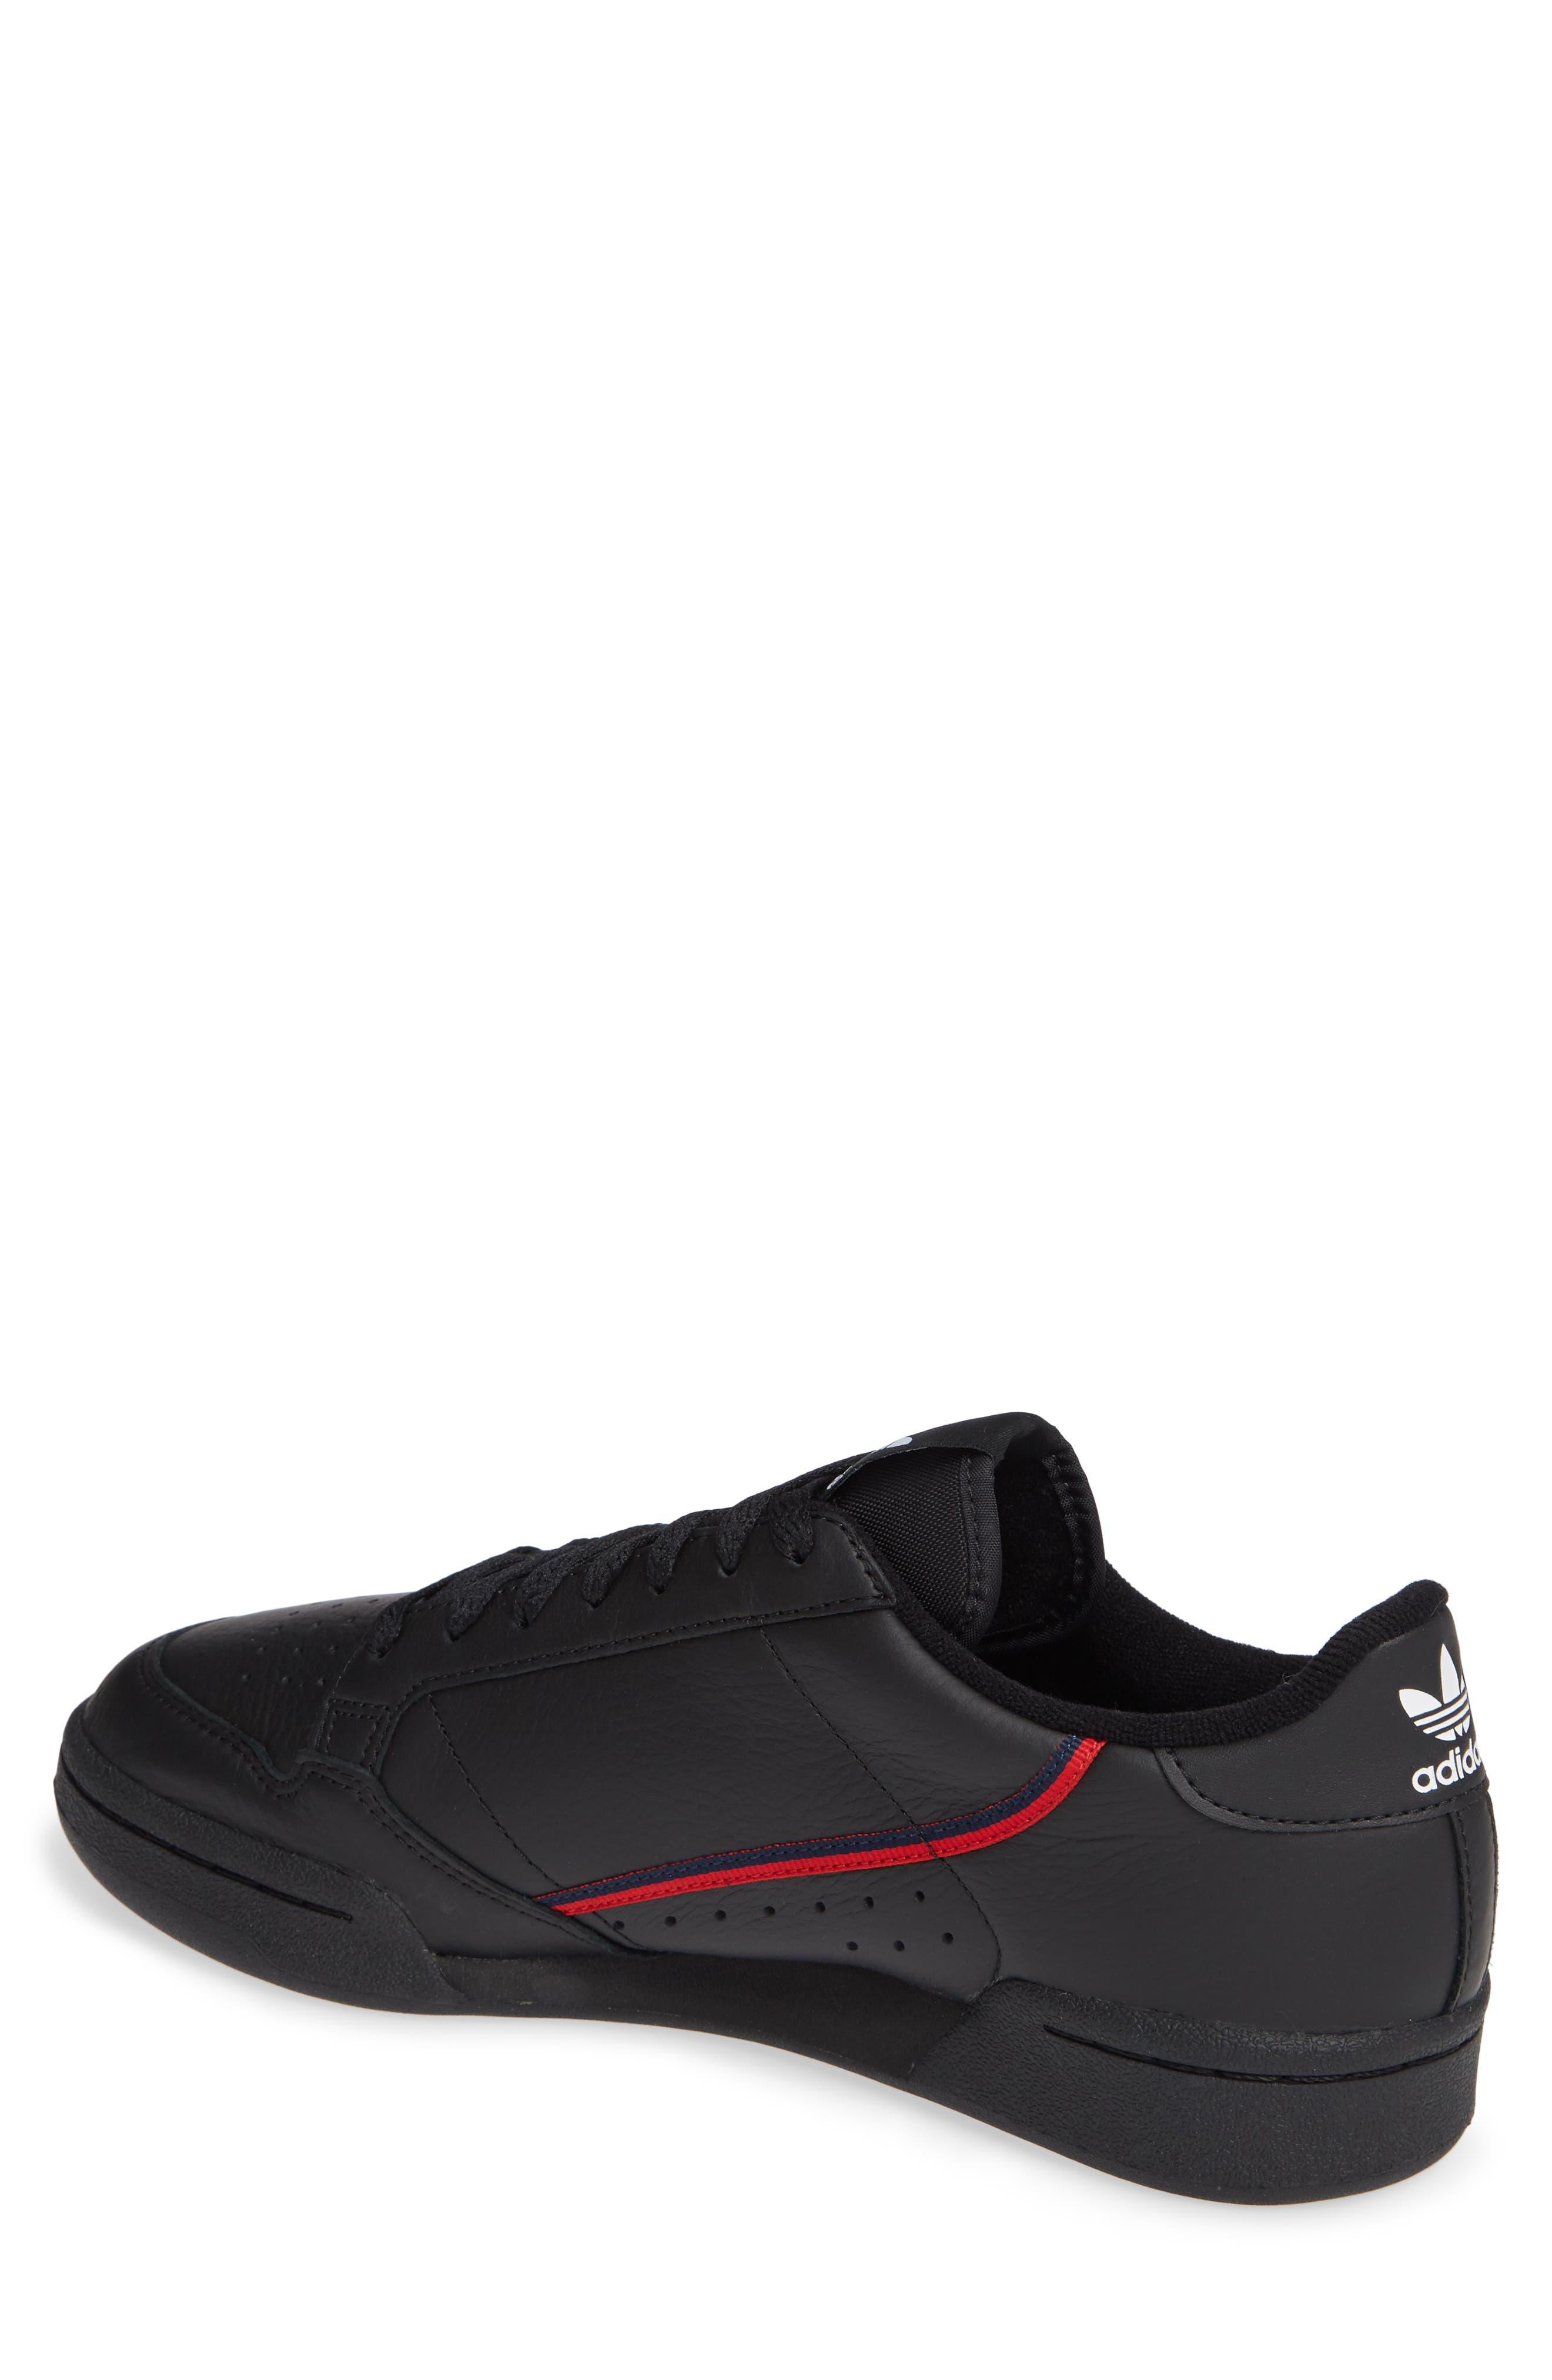 Continental 80 Sneaker,                             Alternate thumbnail 2, color,                             BLACK/ SCARLET/ NAVY